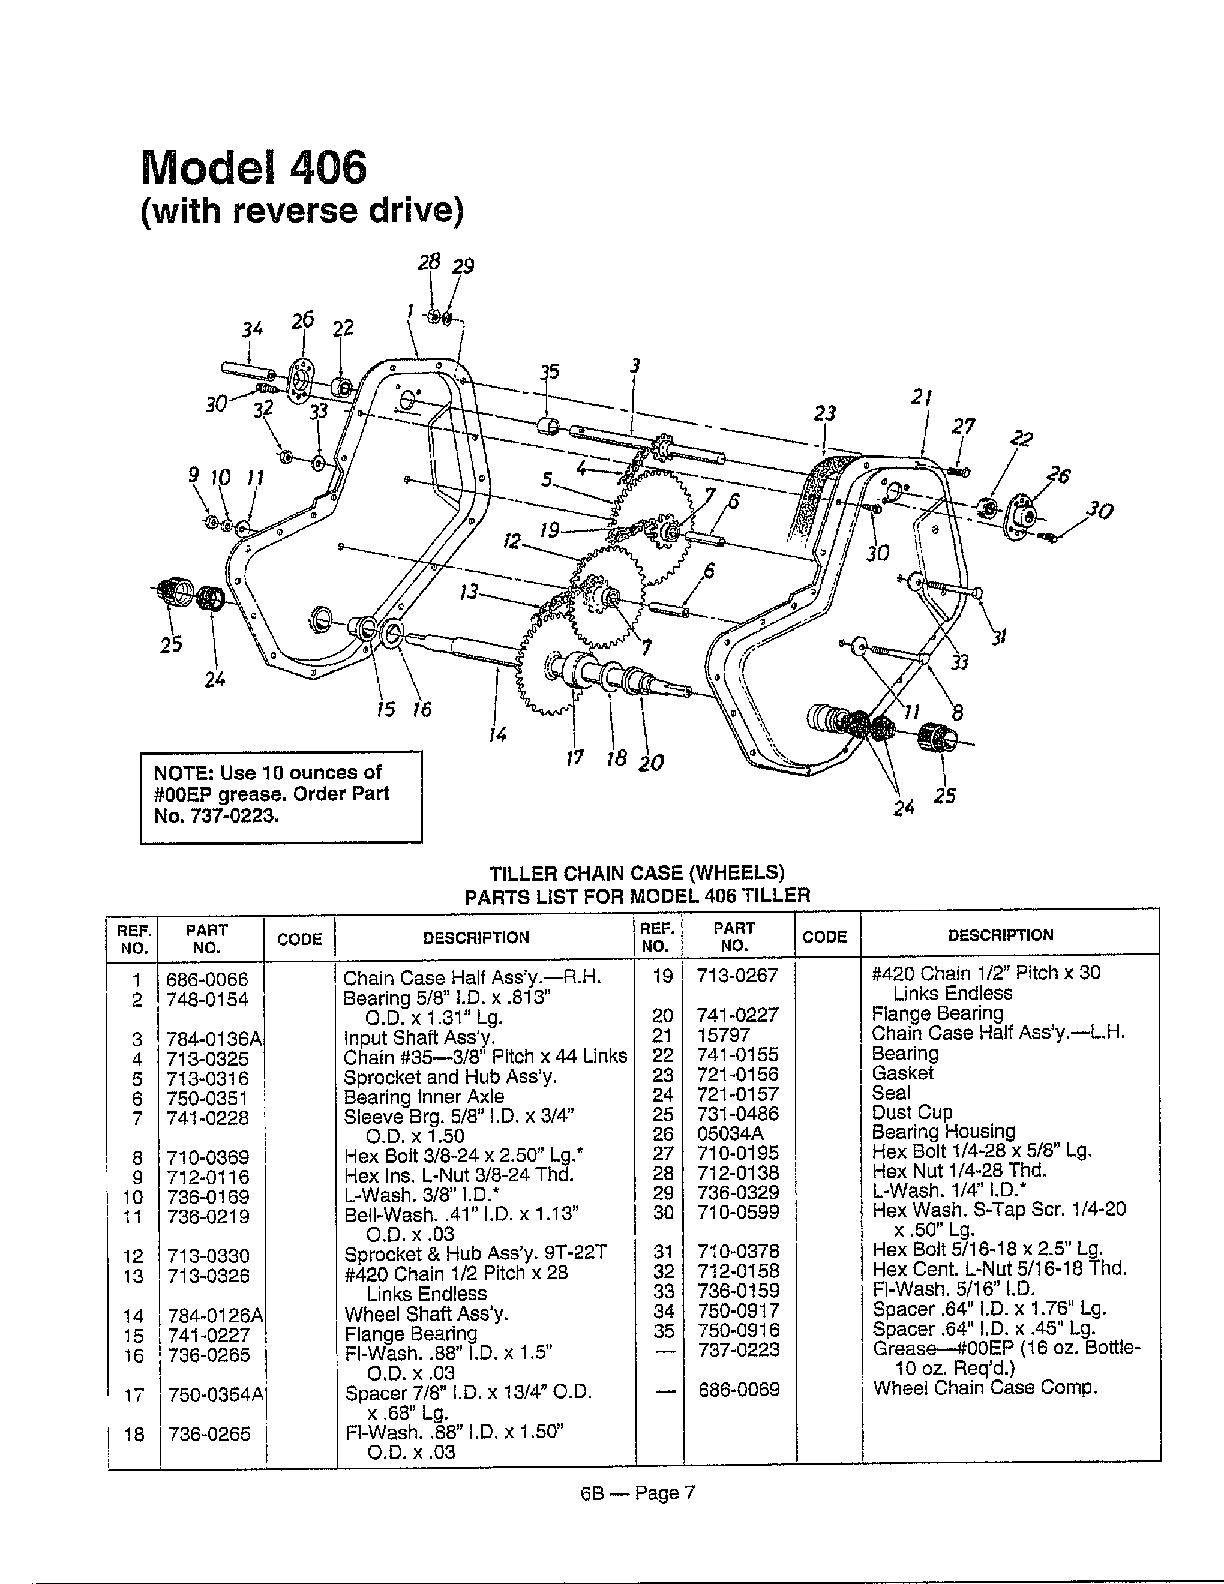 Mtd model 215-410-000 rear tine, gas tiller genuine parts